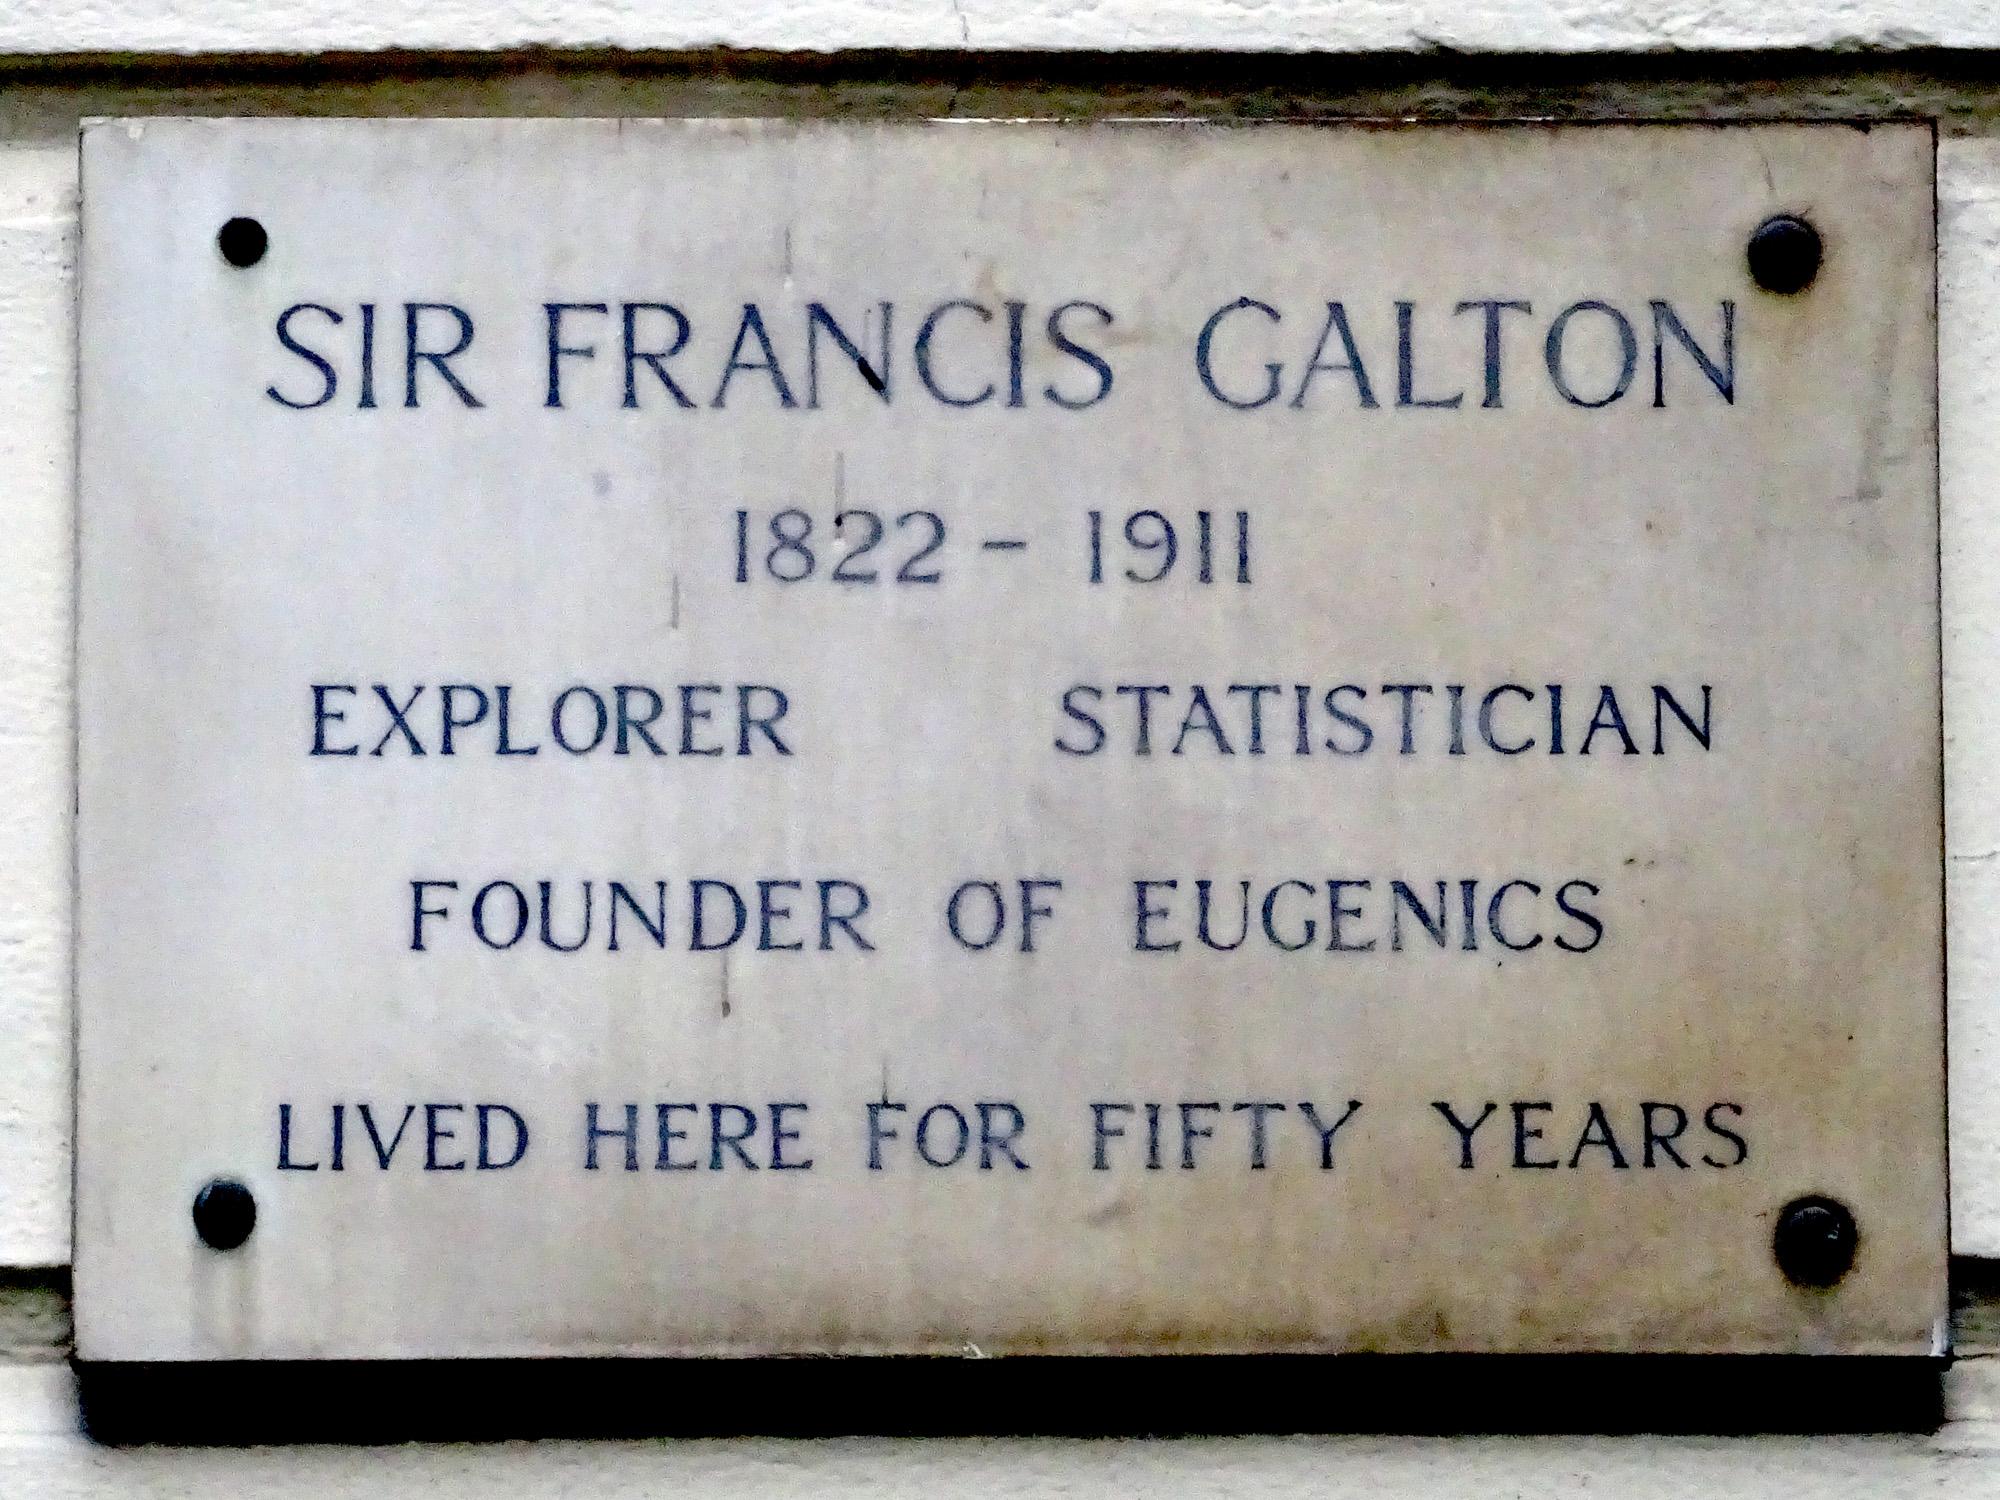 File:SIR FRANCIS GALTON 1822-1911 EXPLORER STATISTICIAN